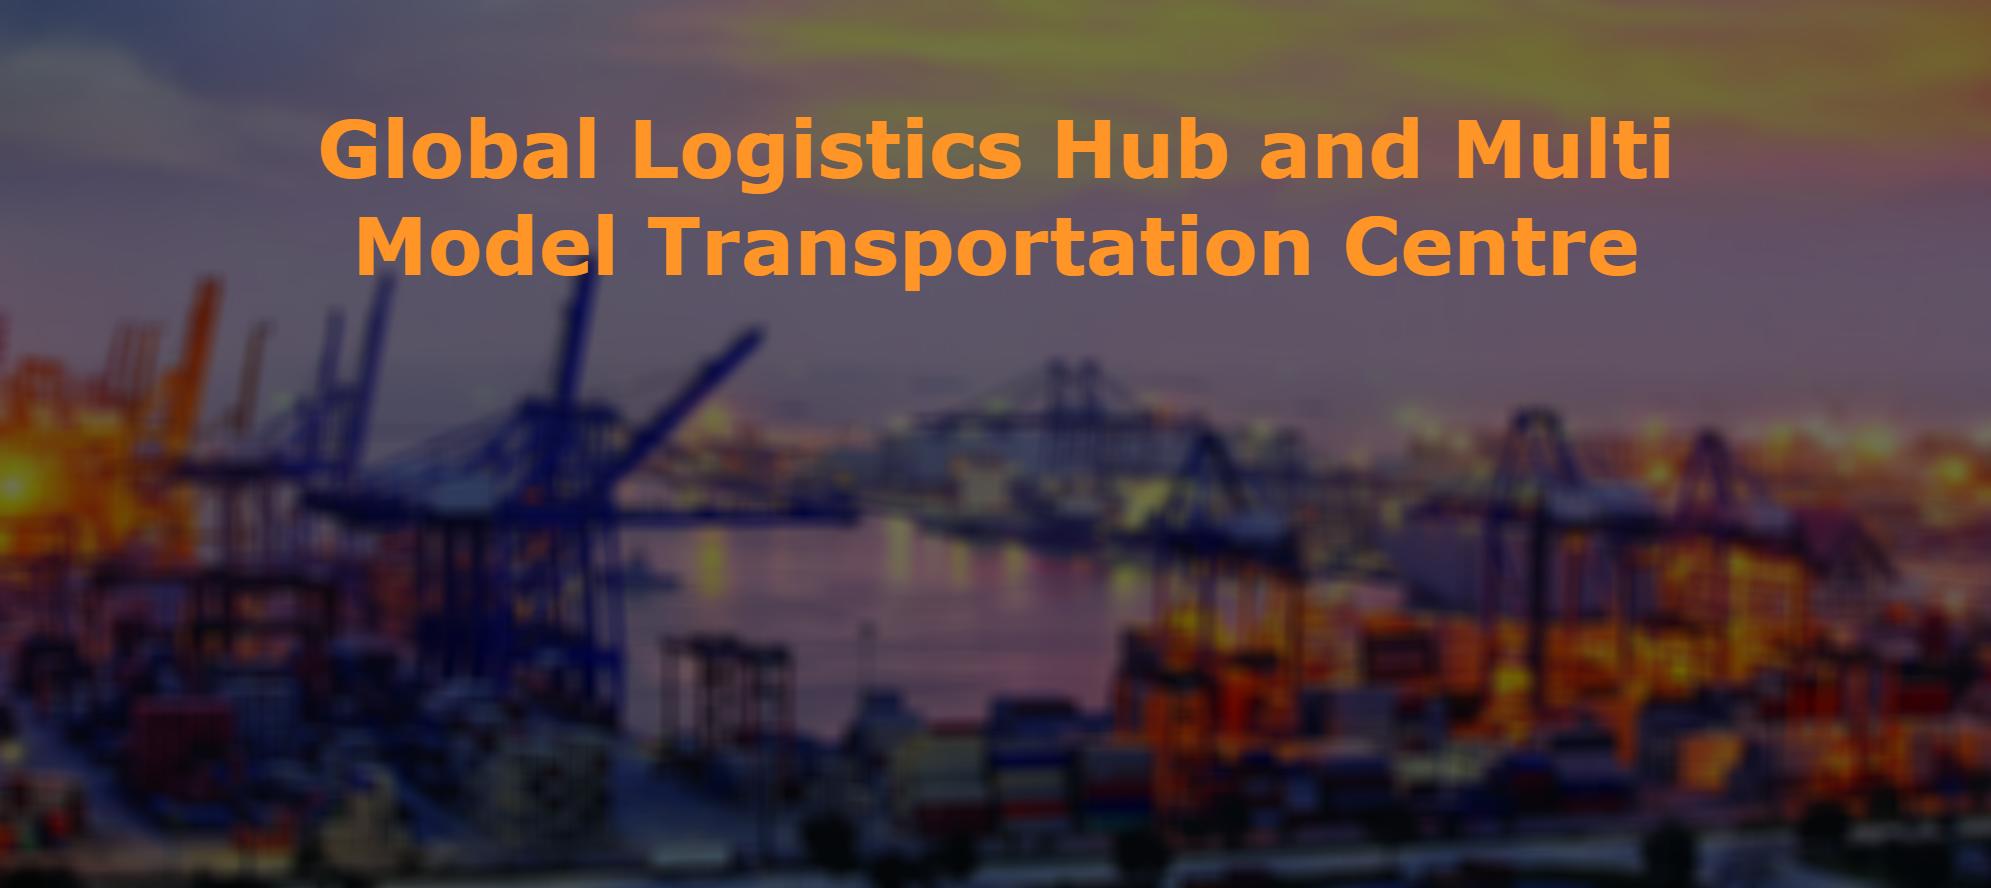 Logistics software demo, UAE logistics industry – opportunities beyond oil business, LogixGRID | Platform and Application for logistics management, LogixGRID | Platform and Application for logistics management